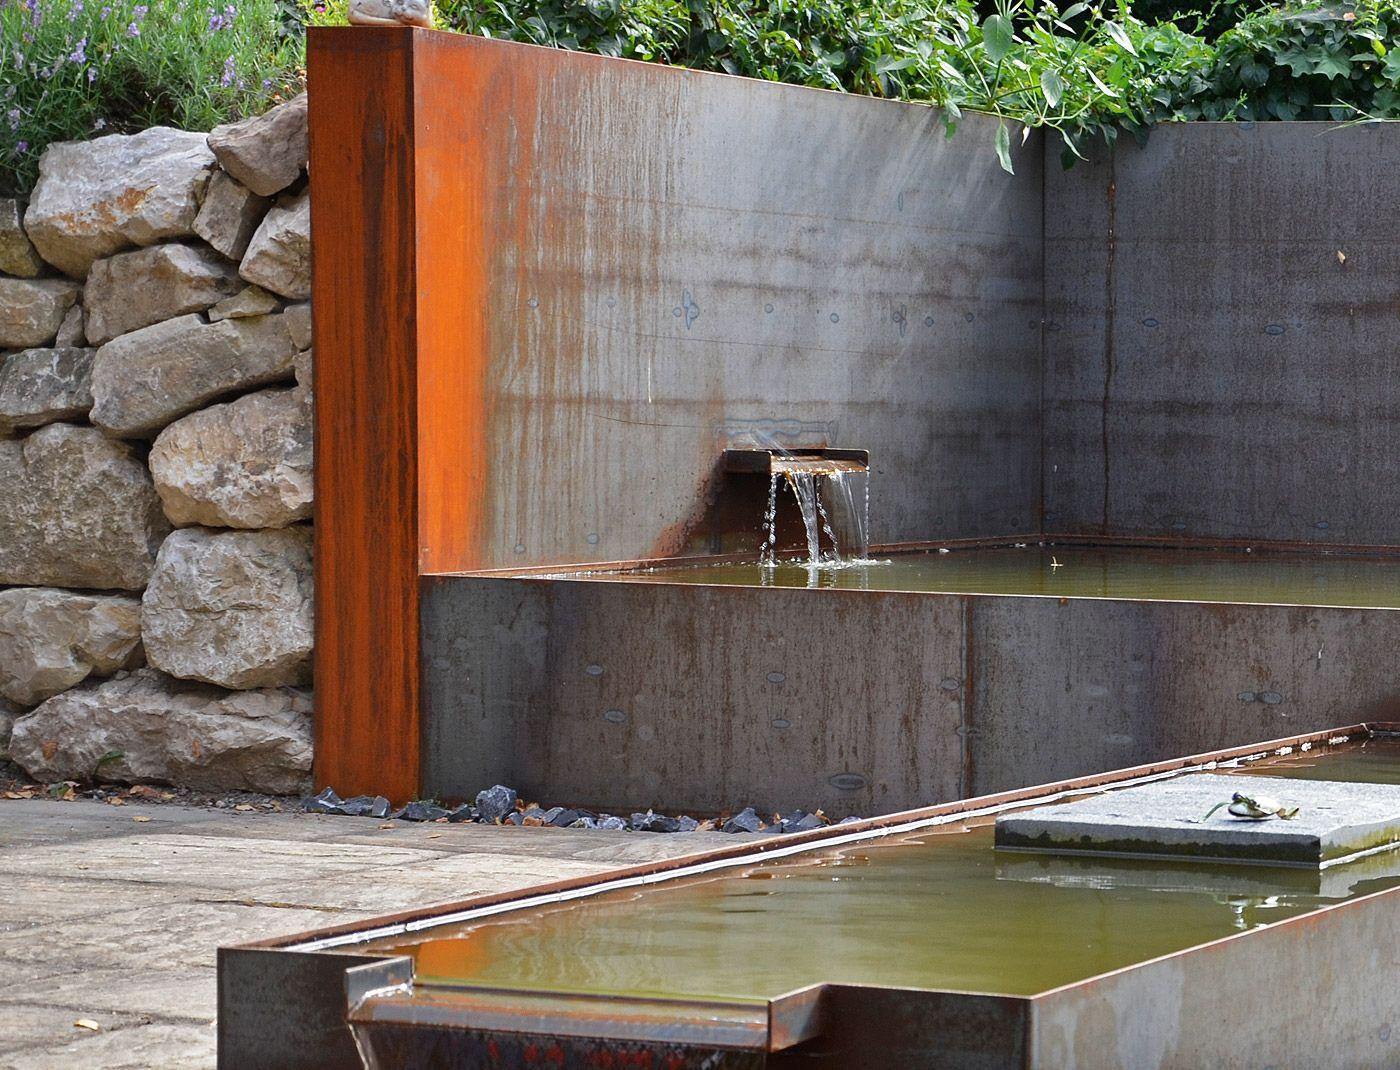 Haas Gartenbau Ag Sichtschutz Windschutz Bern Bremgarten